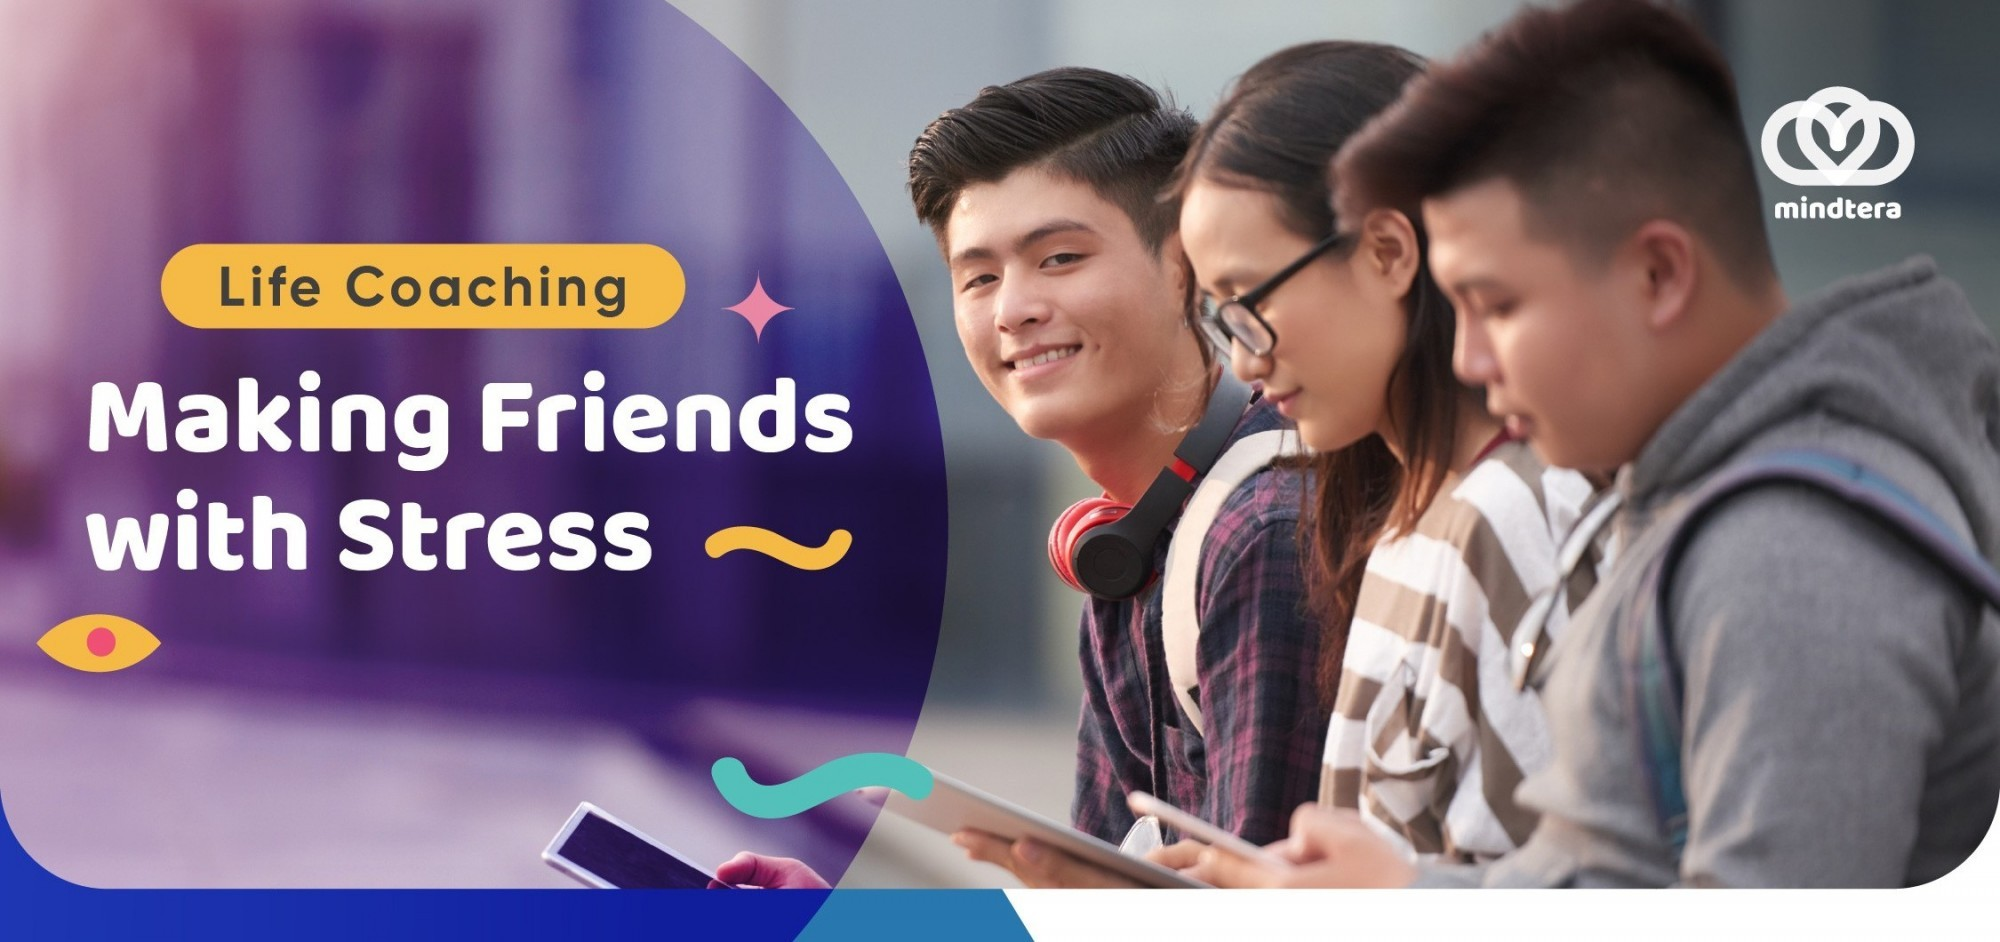 Making Friend with Stress by Mindtera - Universitas Nurdin Hamzah